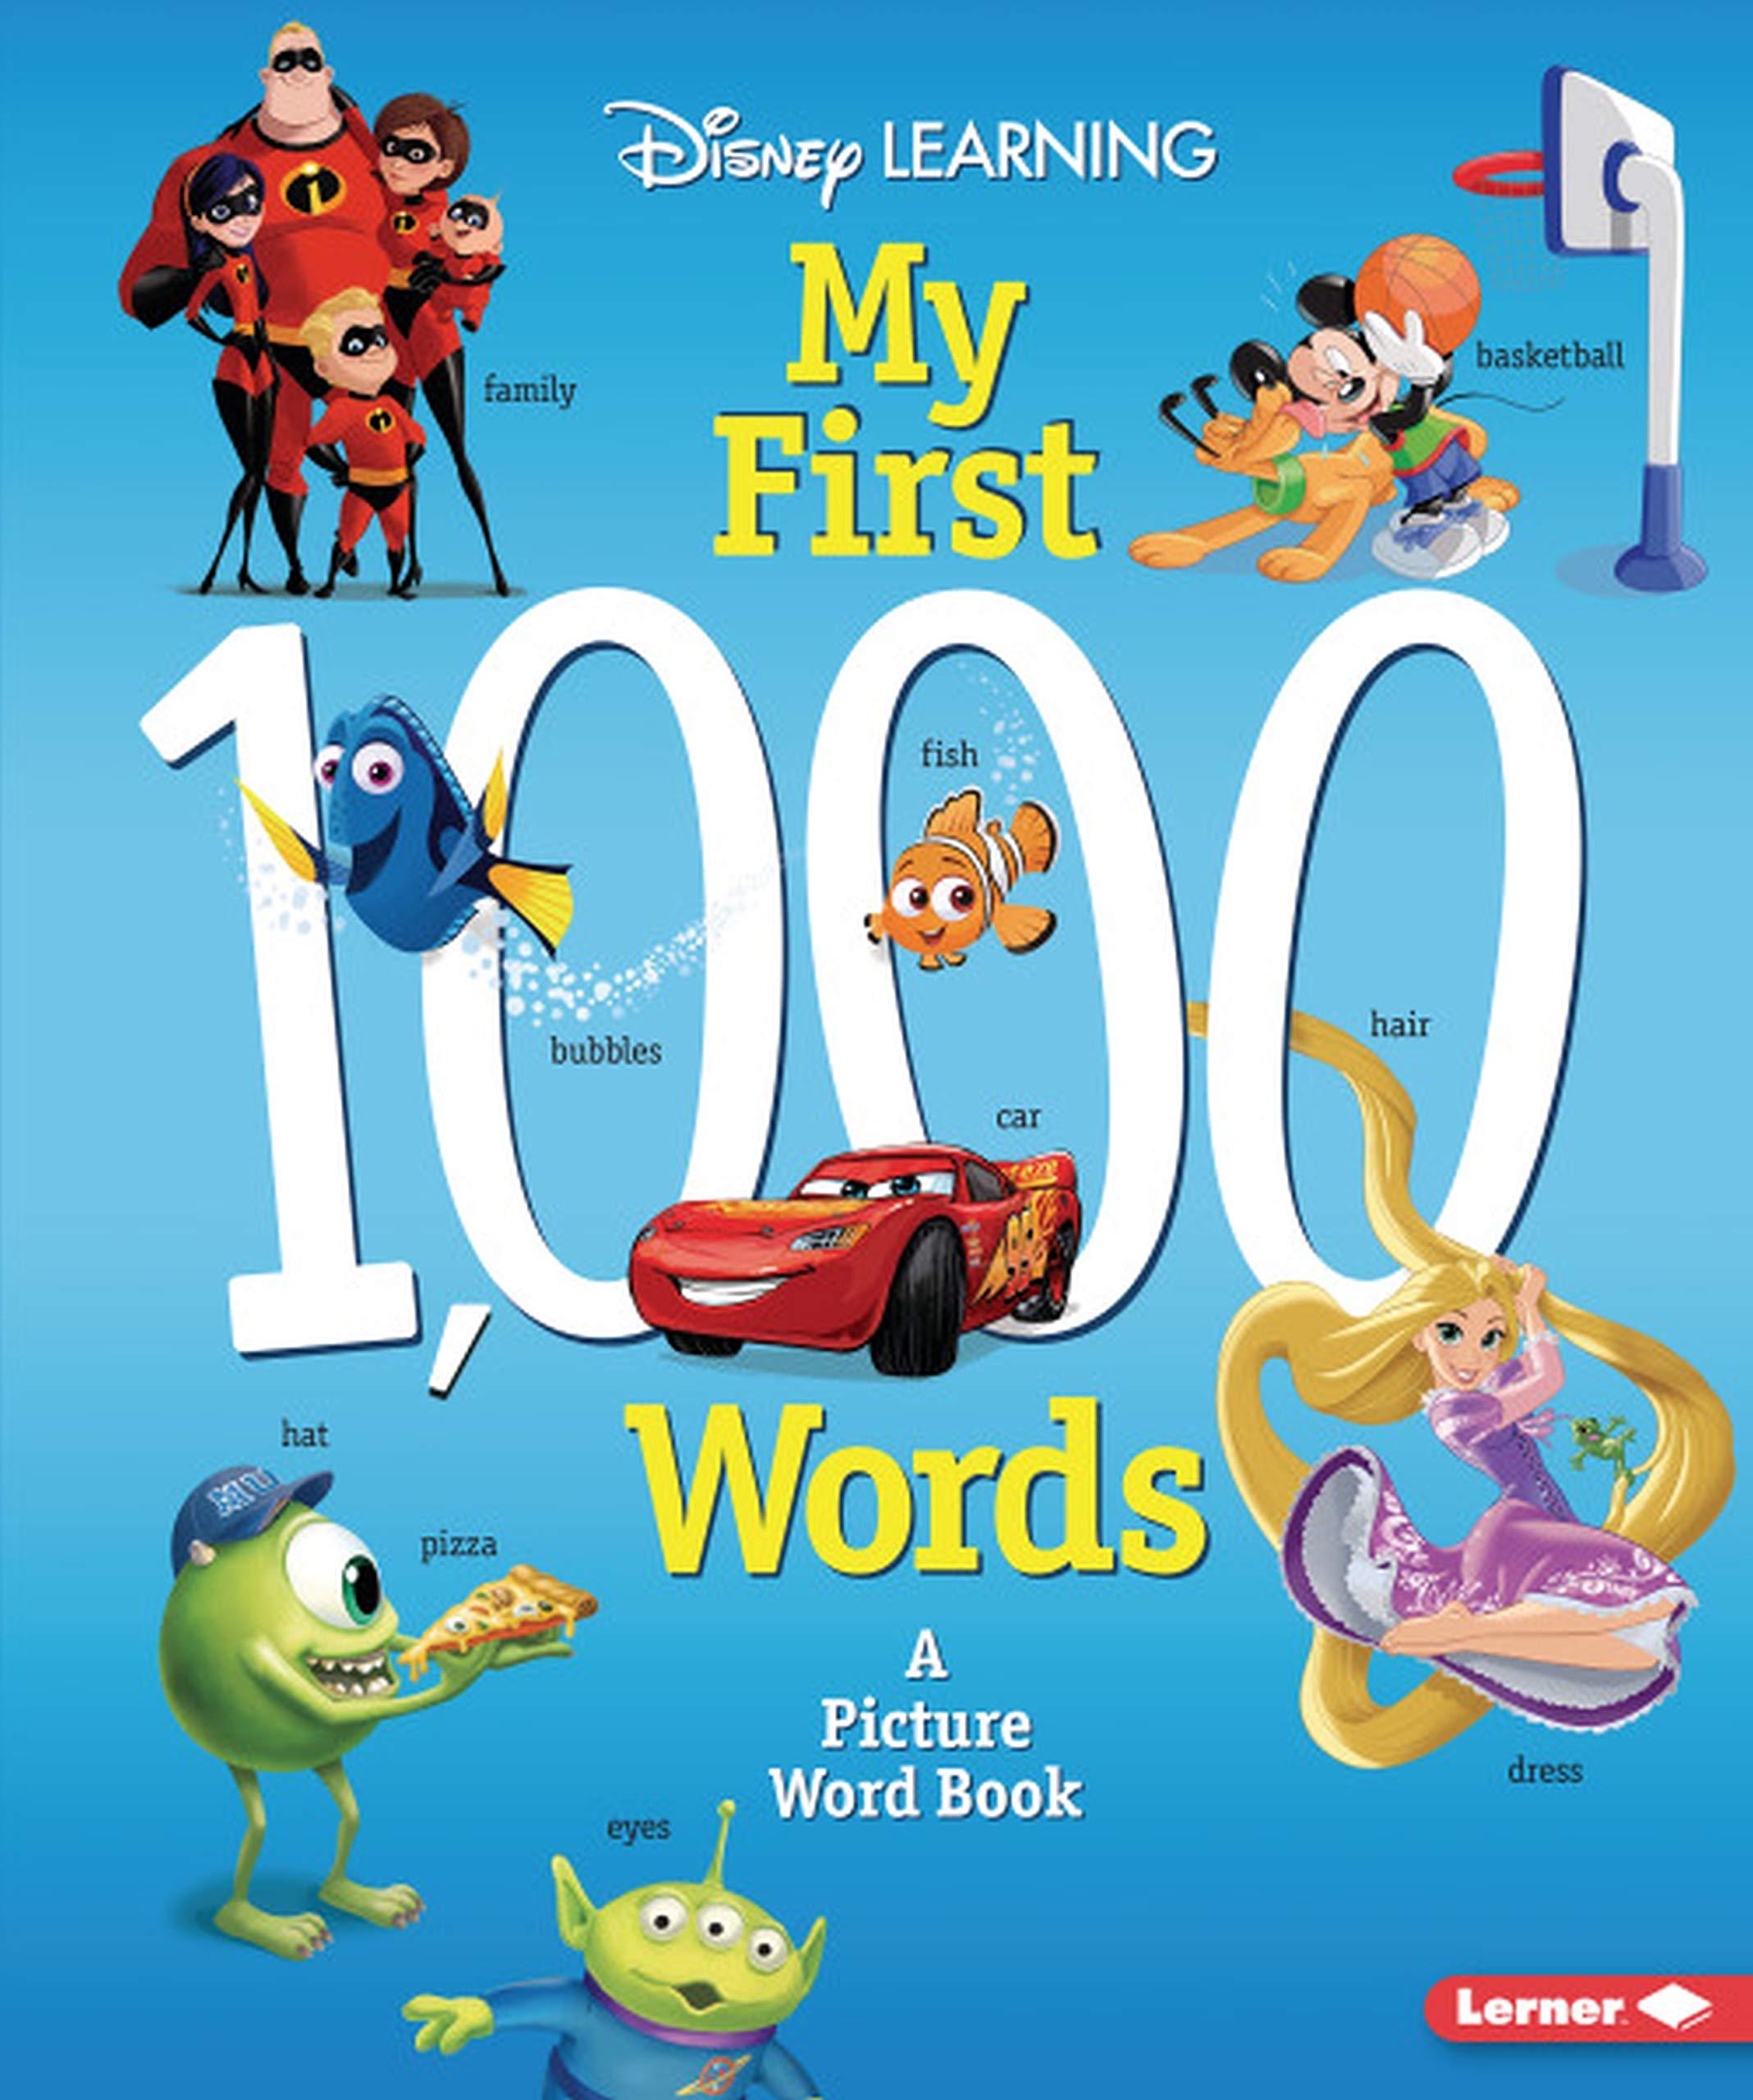 Amazon Com Disney Learning My First 1 000 Words 9781541539129 Yu Erica Books